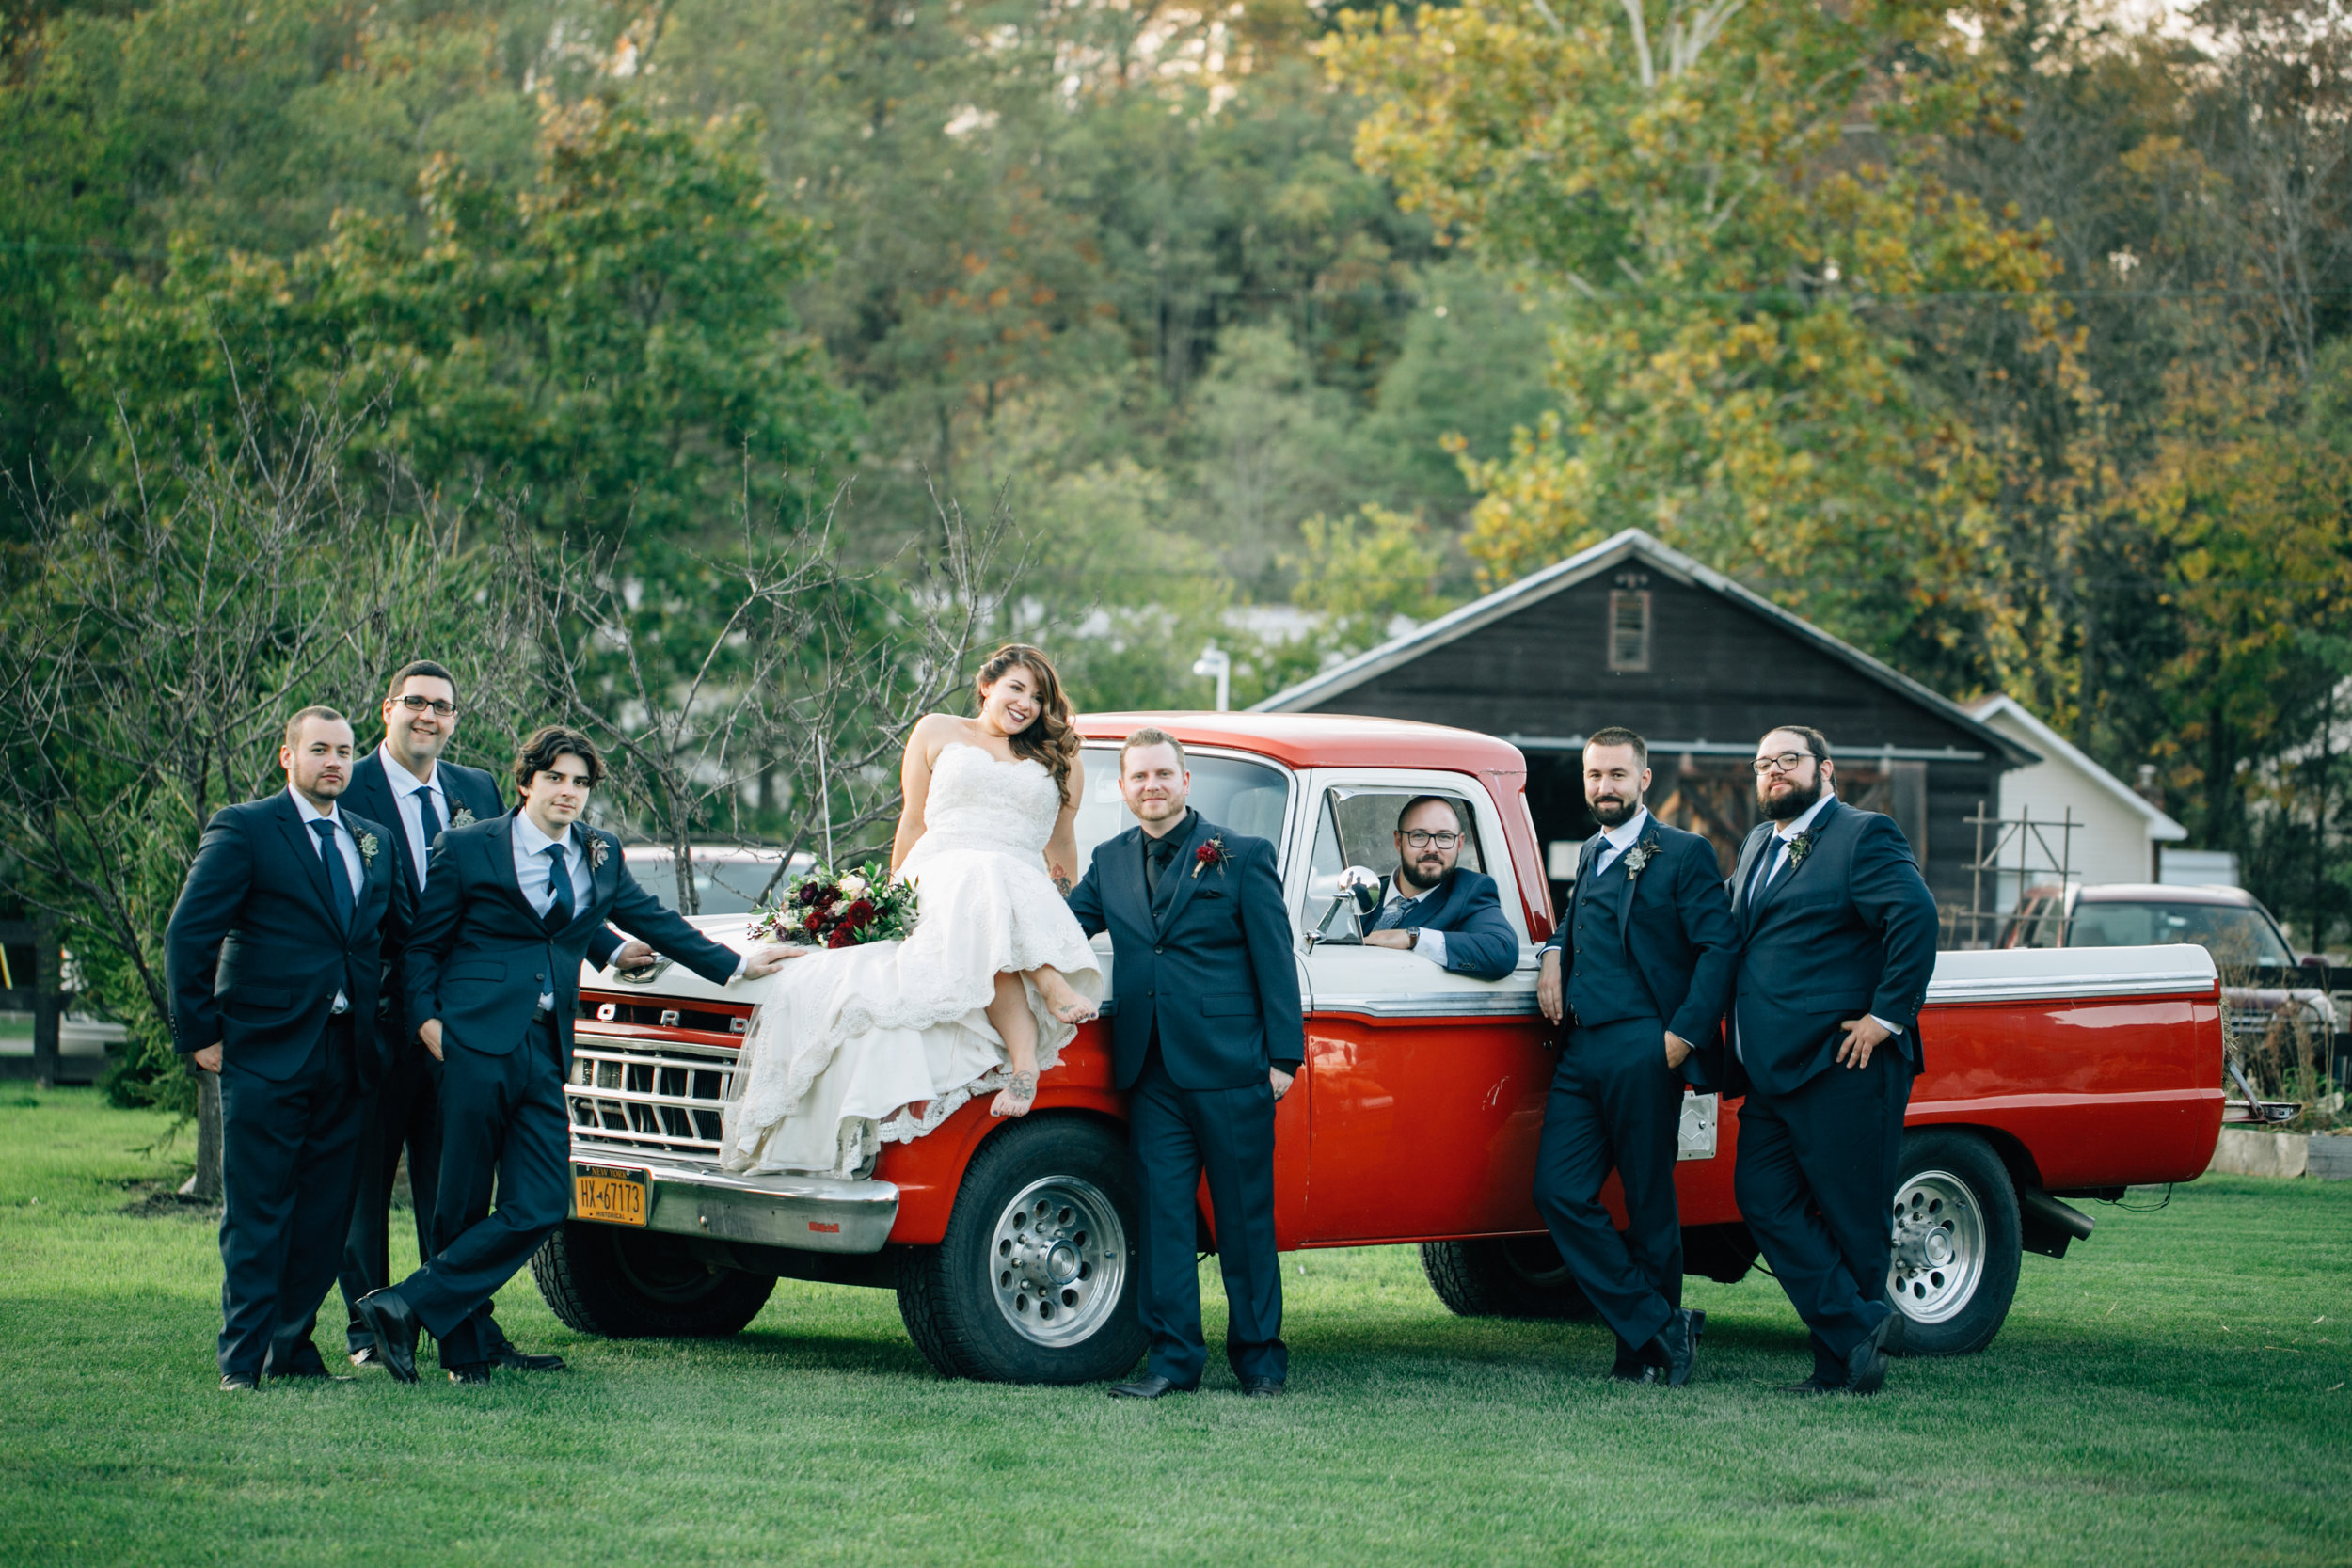 790_alex_audrey_wedding.jpg